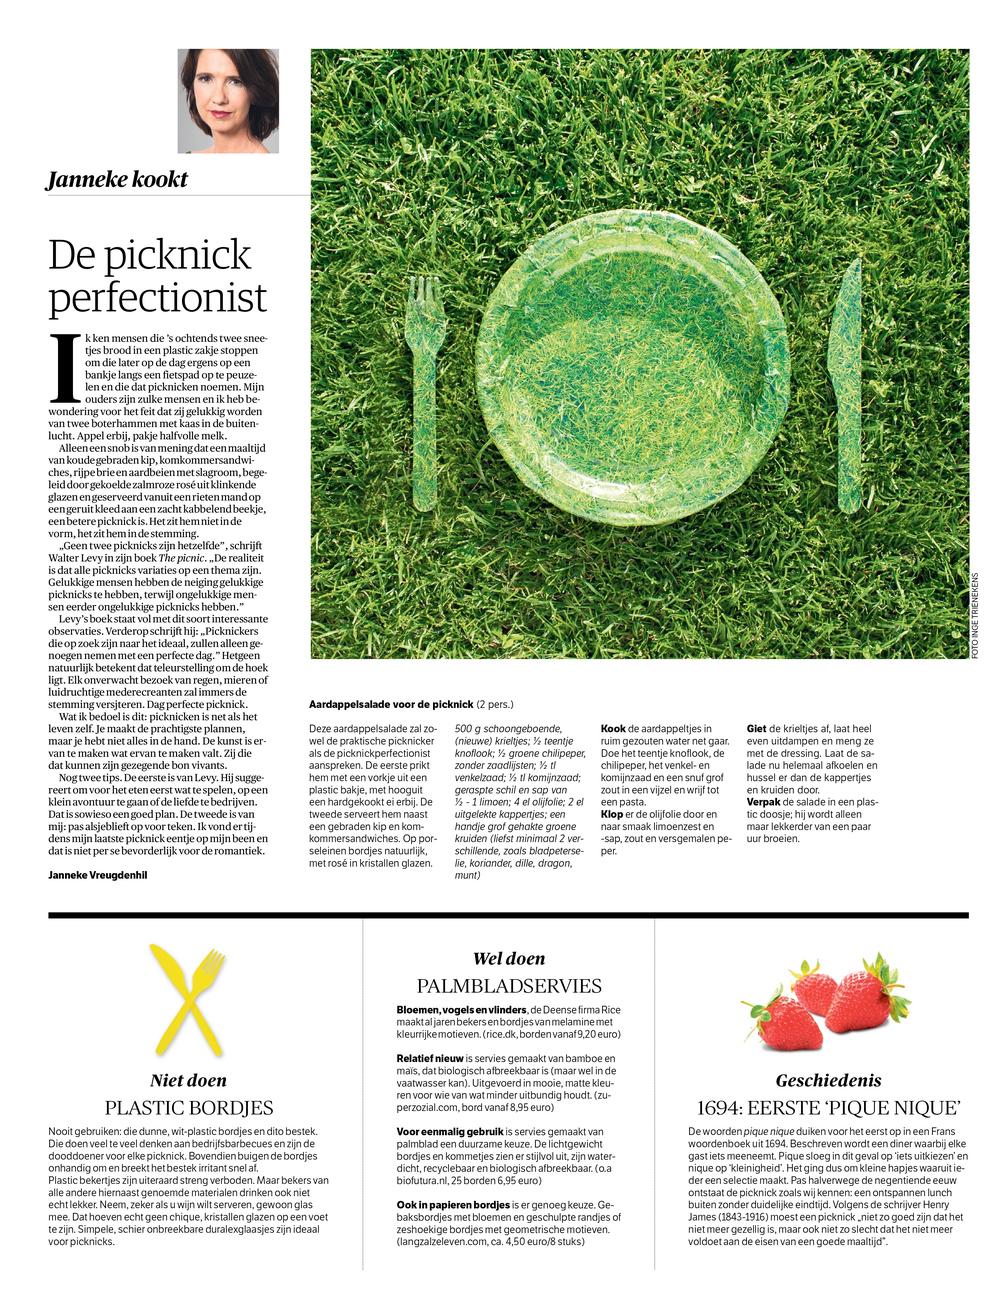 NRC_Handelsblad_20150627_4_08_2.jpg